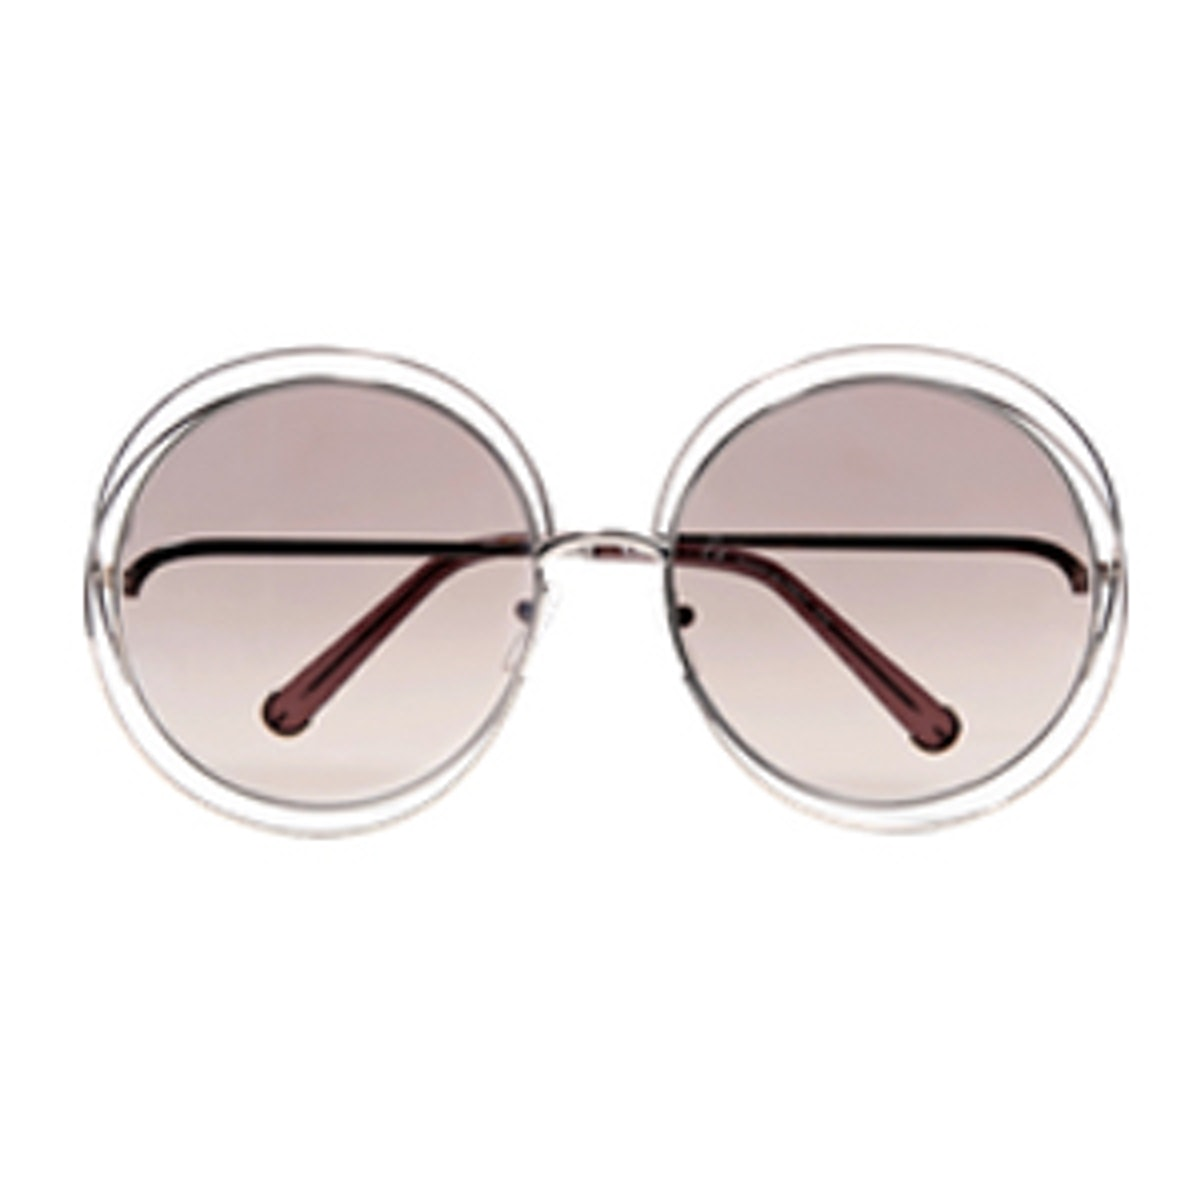 Carlina Round-Frame Gold-Tone Sunglasses